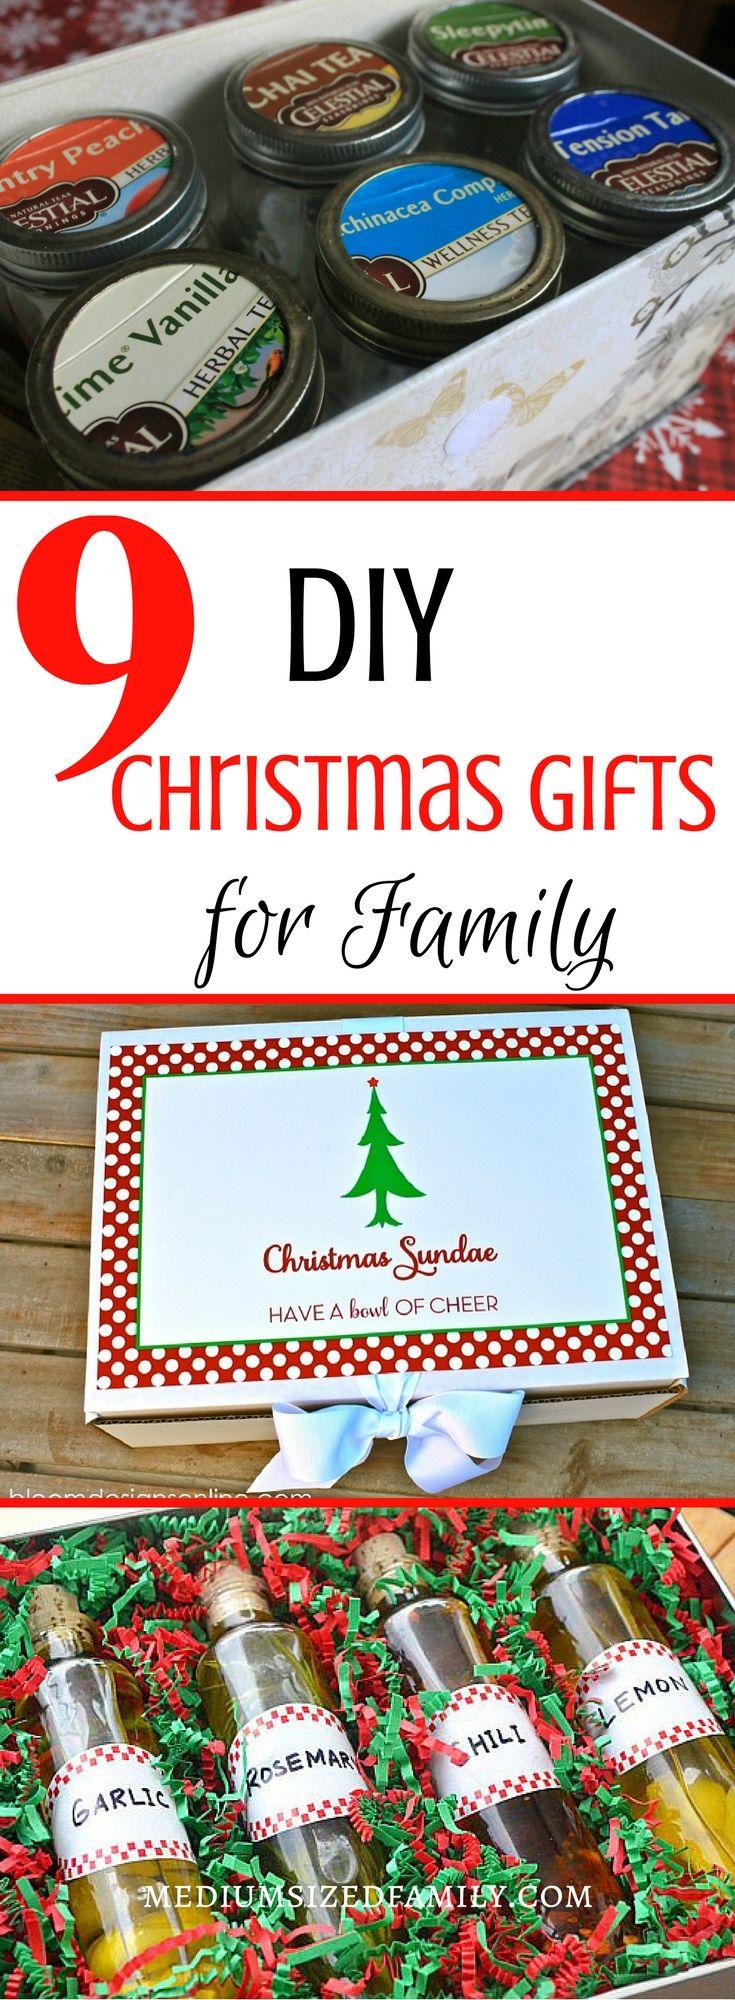 7 Ways To Pile Up Christmas Money Do It Yourself Christmas Presents Family Christmas Gifts Christmas Money Christmas Diy Kids